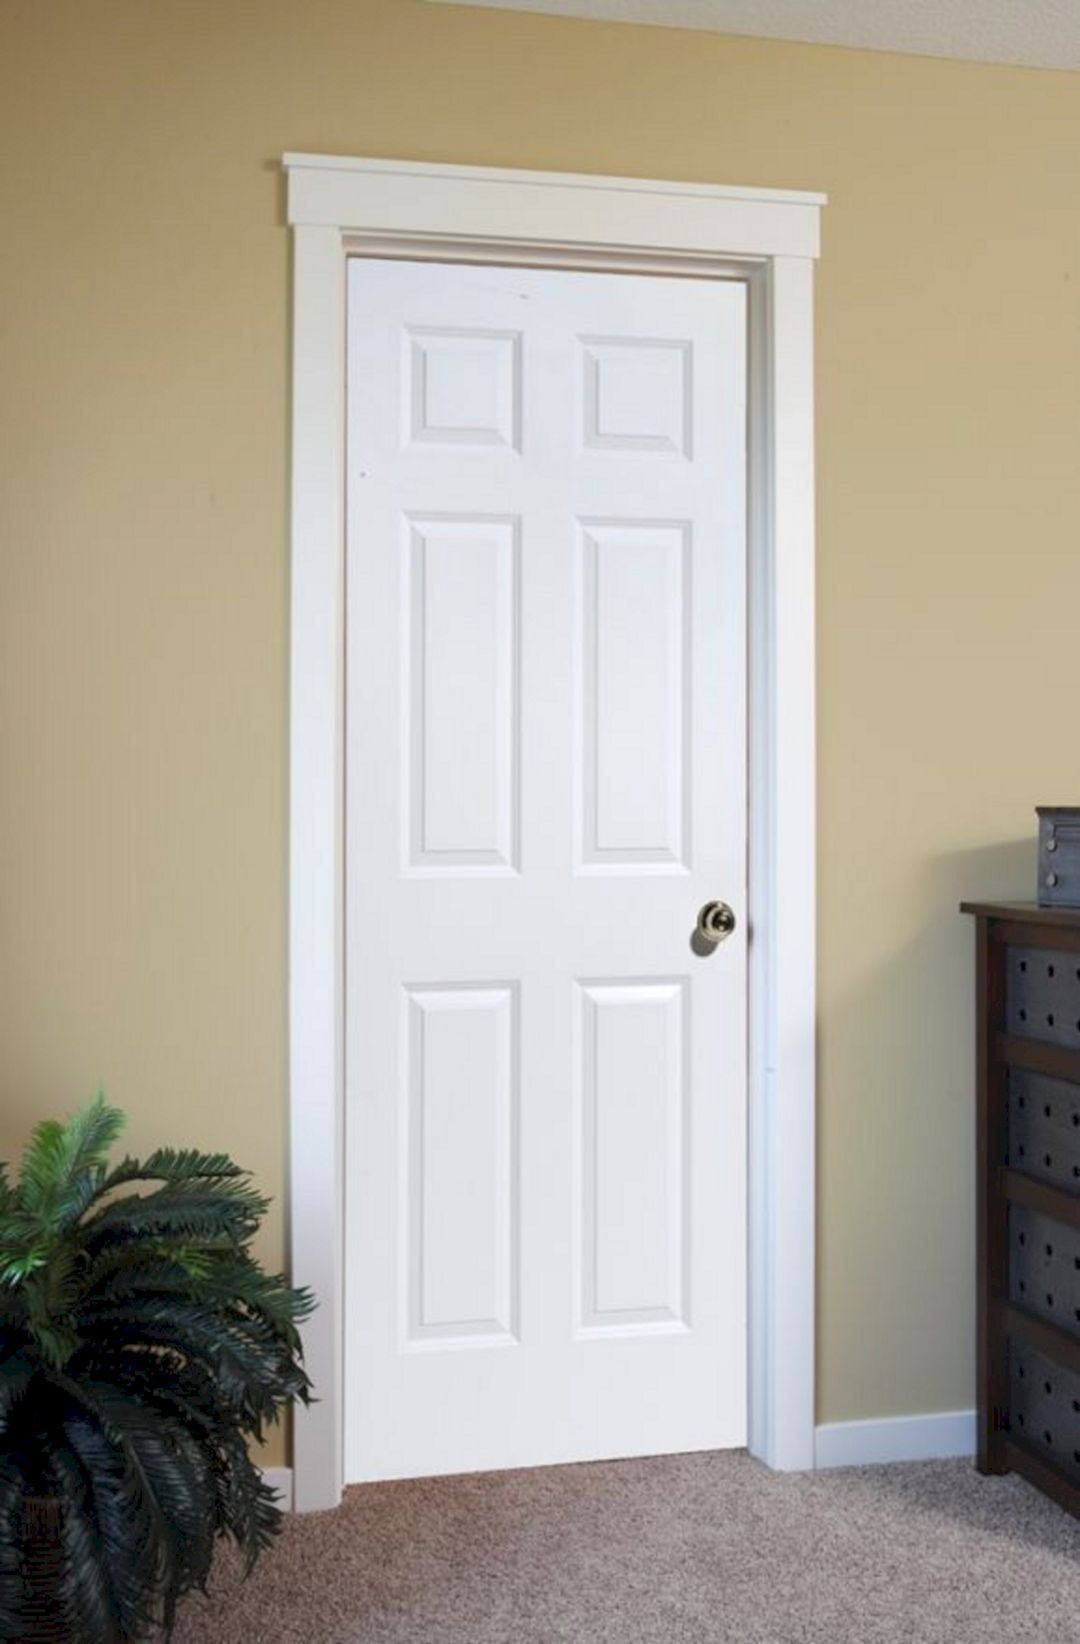 6 Panel Interior Doors 6 Panel Interior Doors Design Ideas And Photos White Interior Doors Doors Interior Sliding Doors Interior